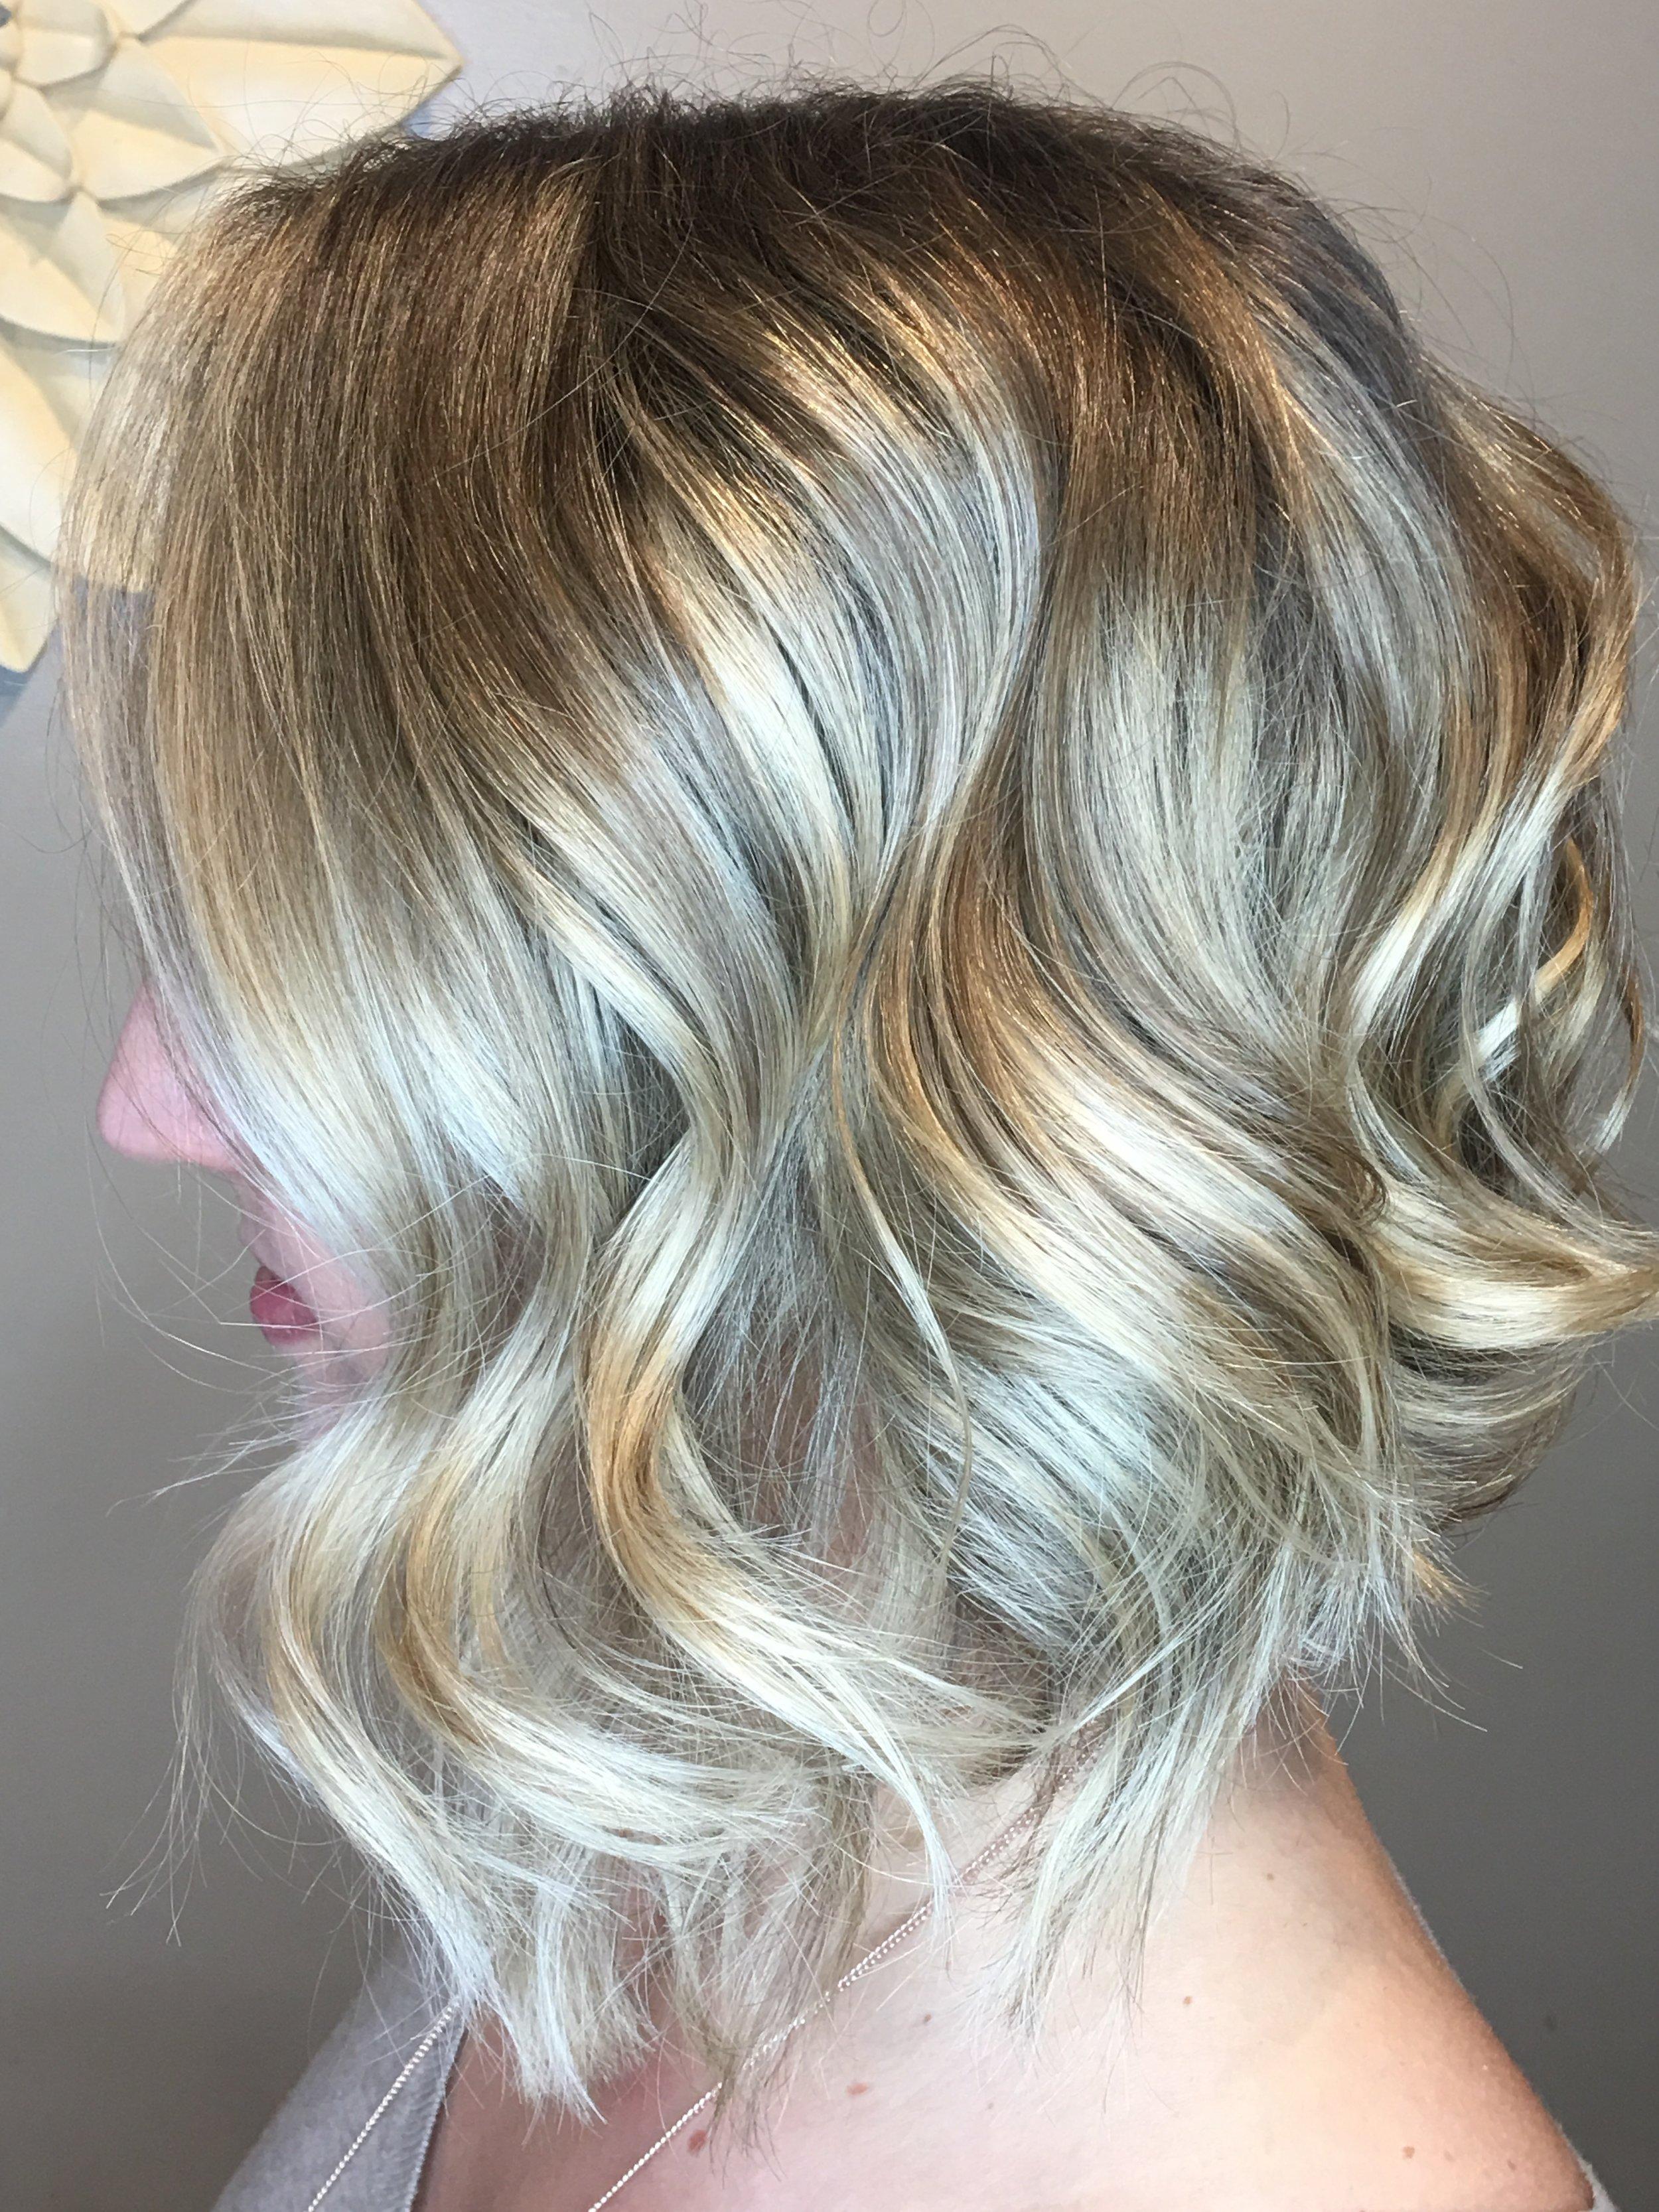 Hair by Elaine